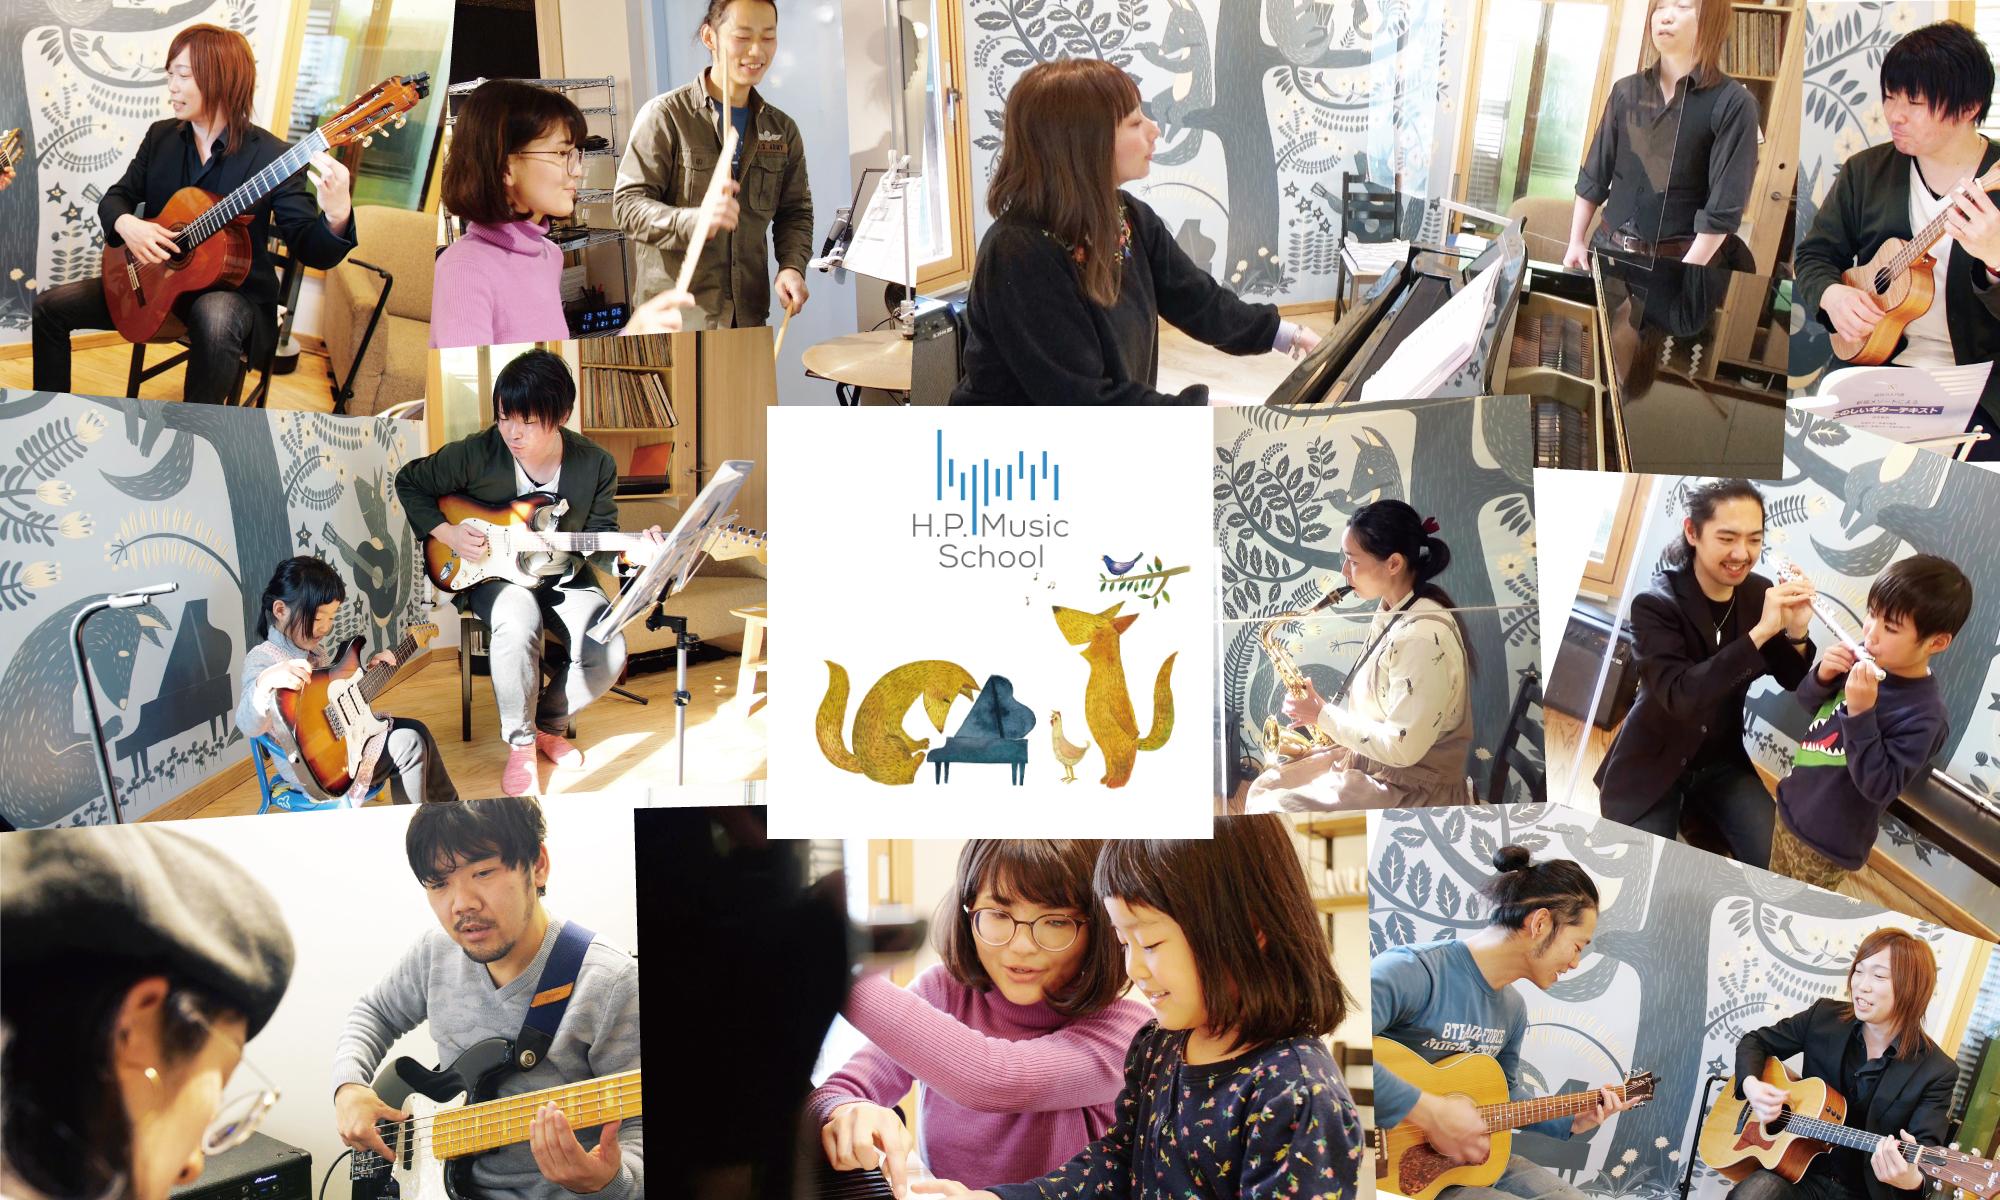 H.P. Music School